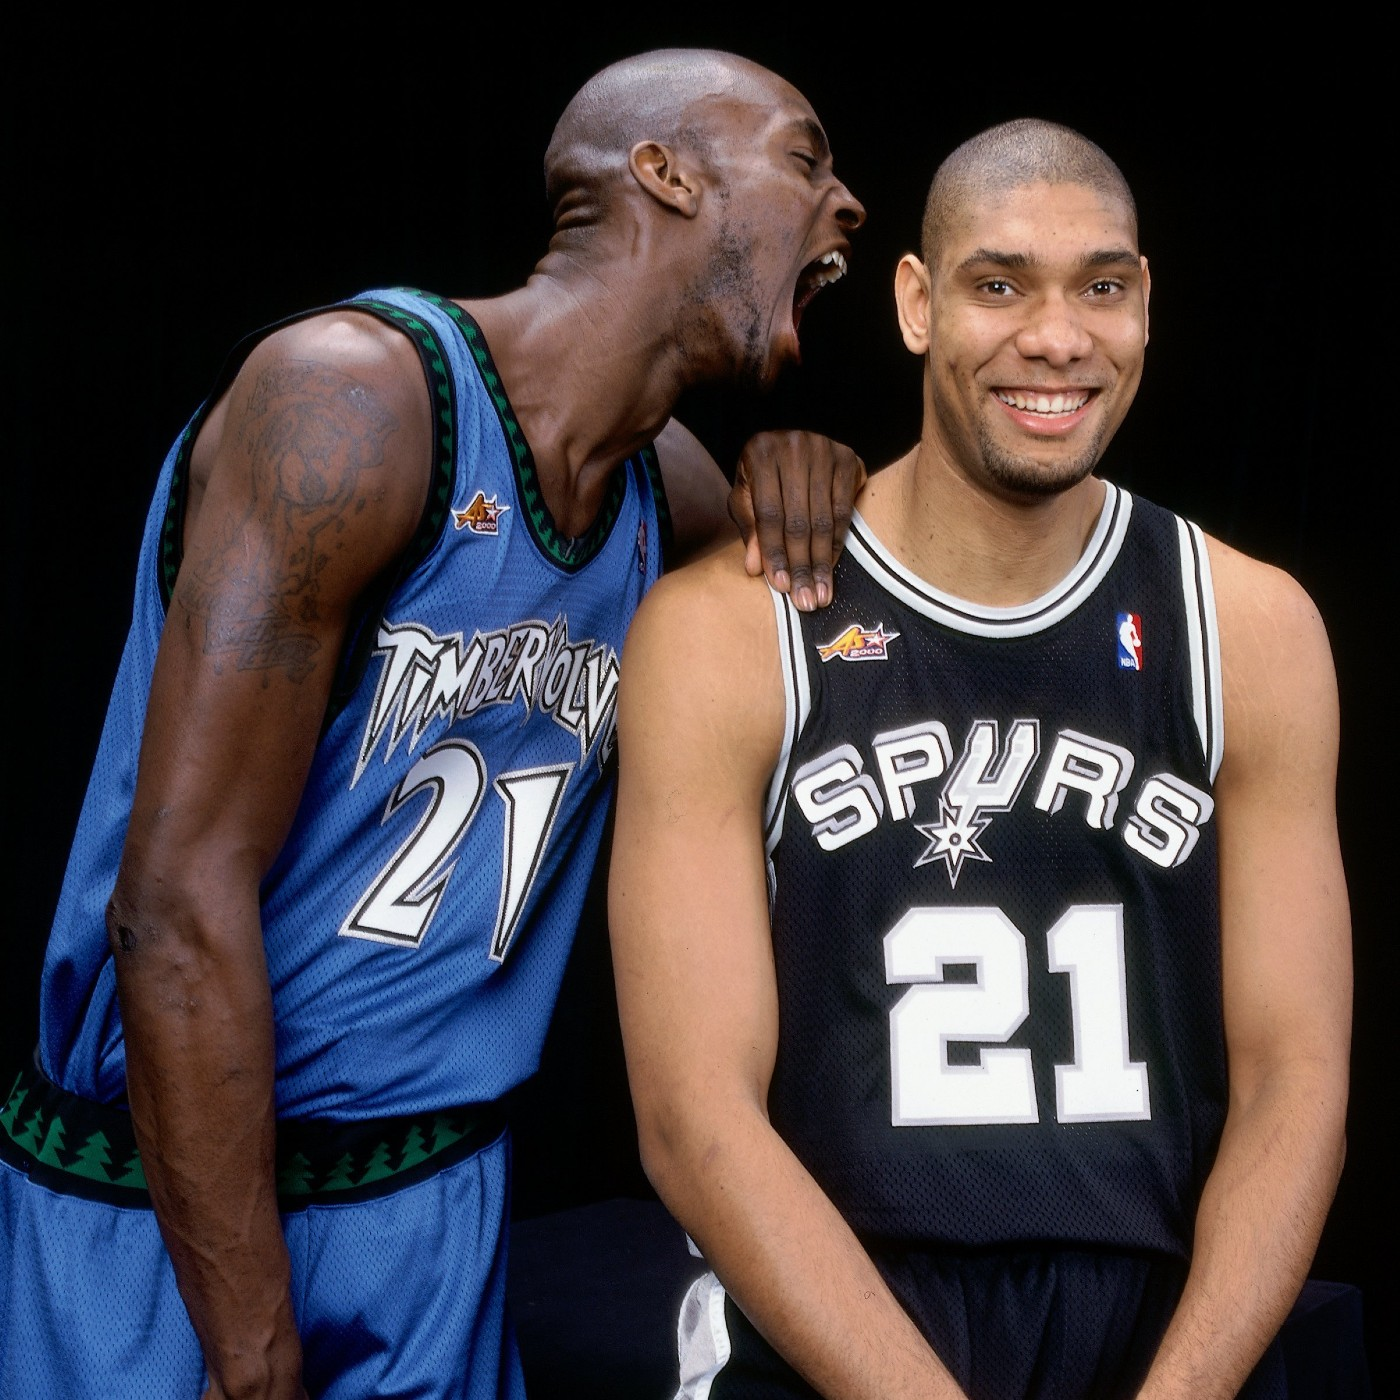 [20-21] NBA Week 17:LaMarcus Aldridge生涯回顧、歷史偉大大前鋒金字塔、石佛 vs. 狼王 & more